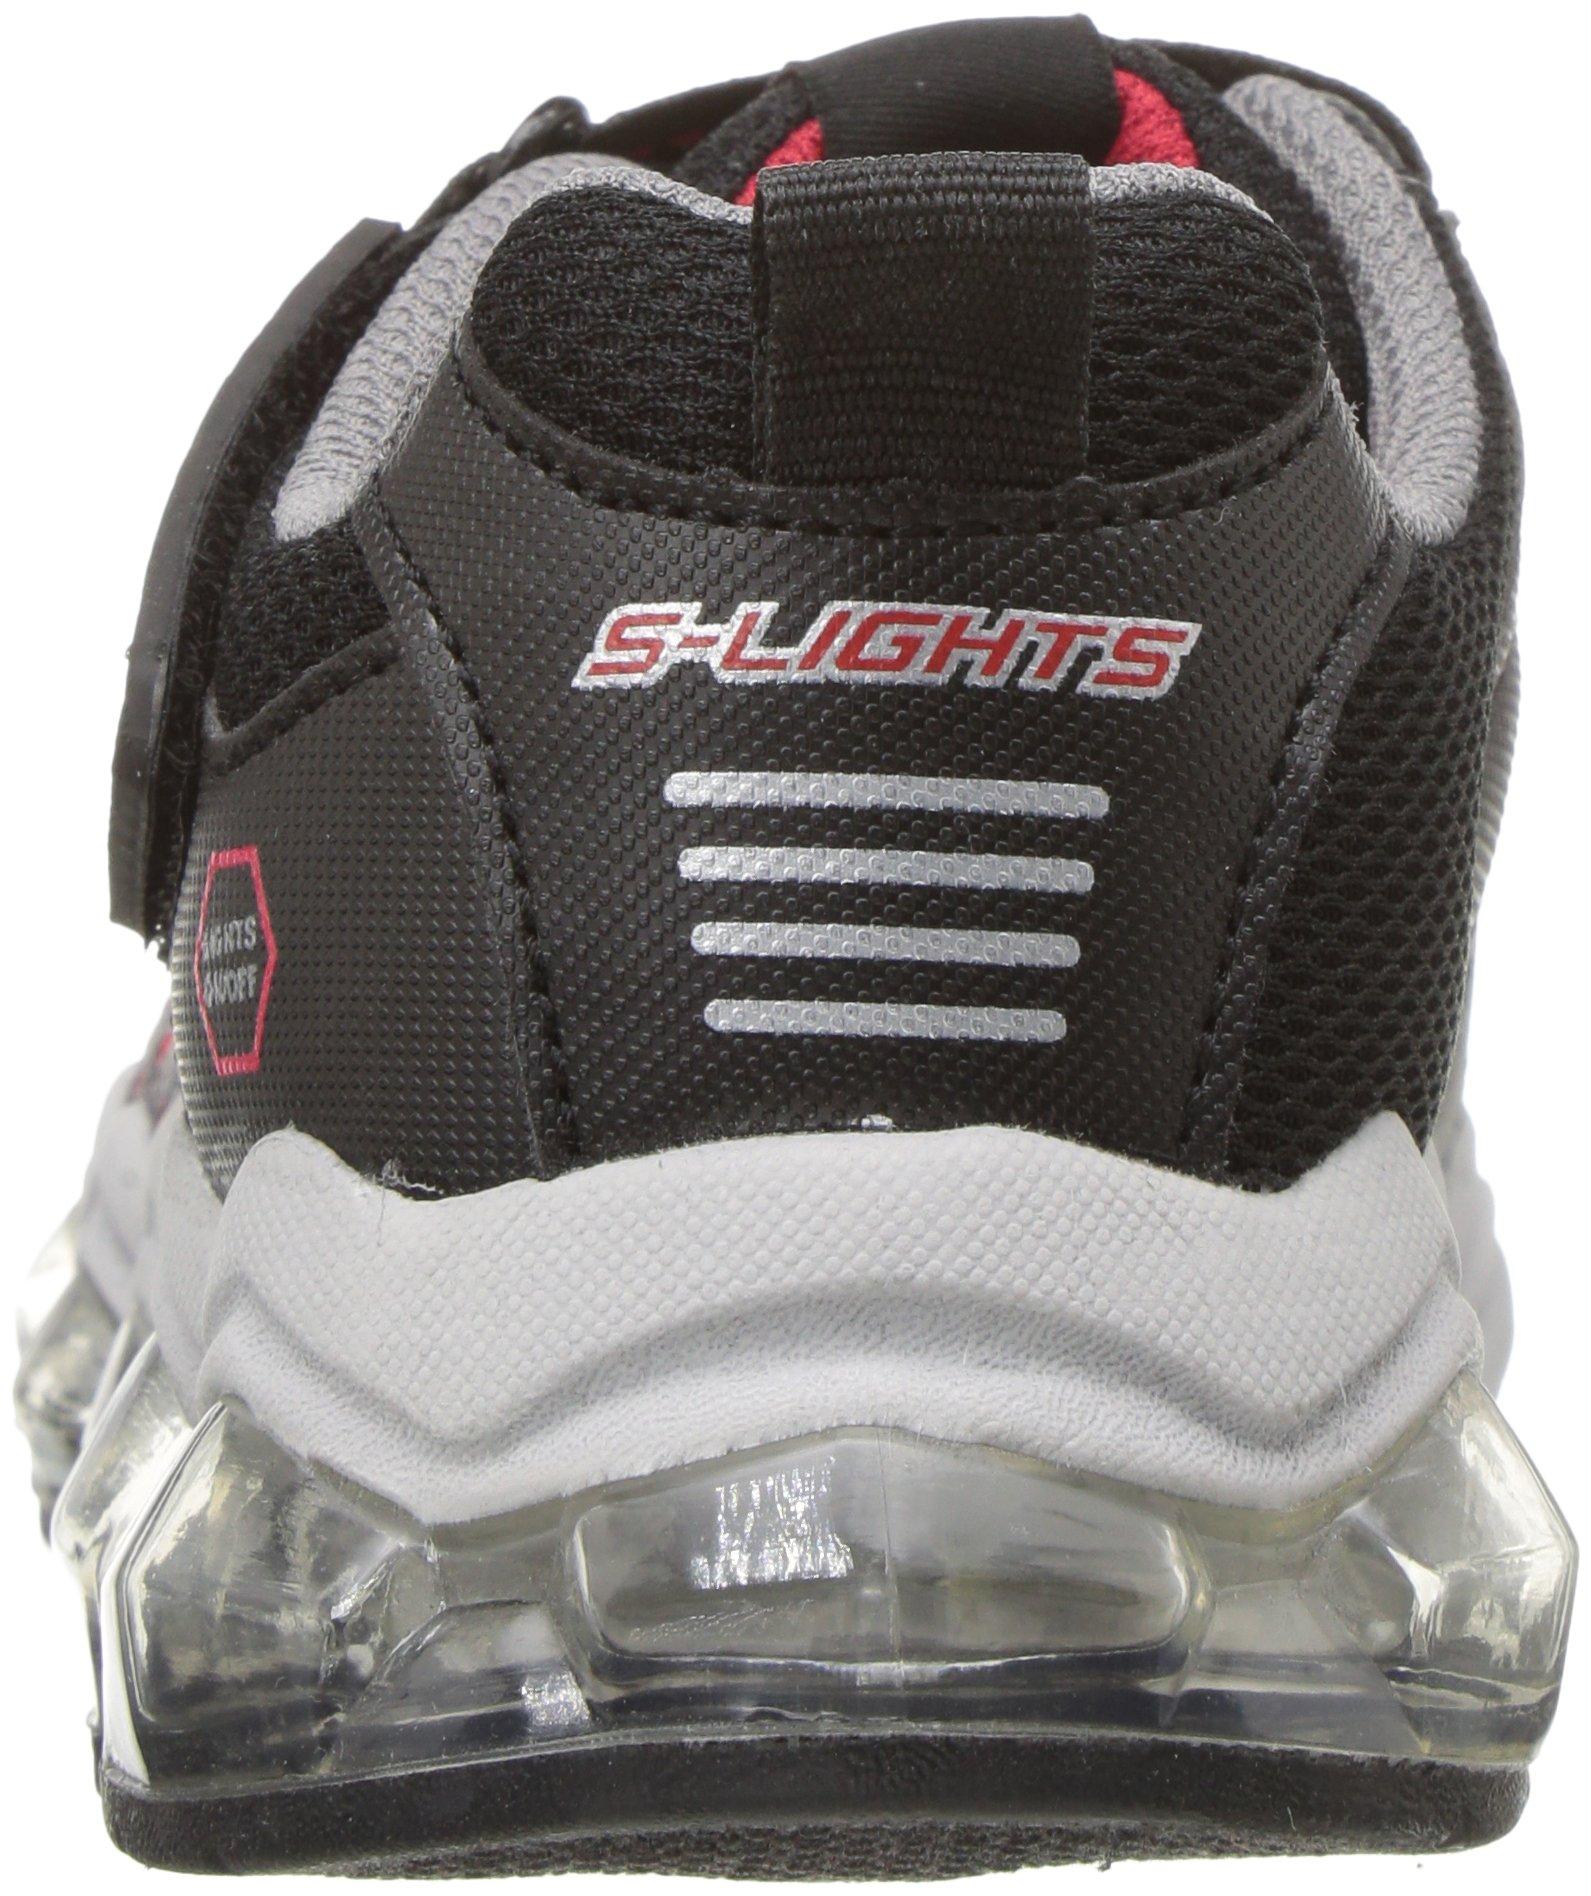 Skechers Kids Boys' Turbo-Flash-90596L Sneaker,Black/red,3 Medium US Little Kid by Skechers (Image #2)